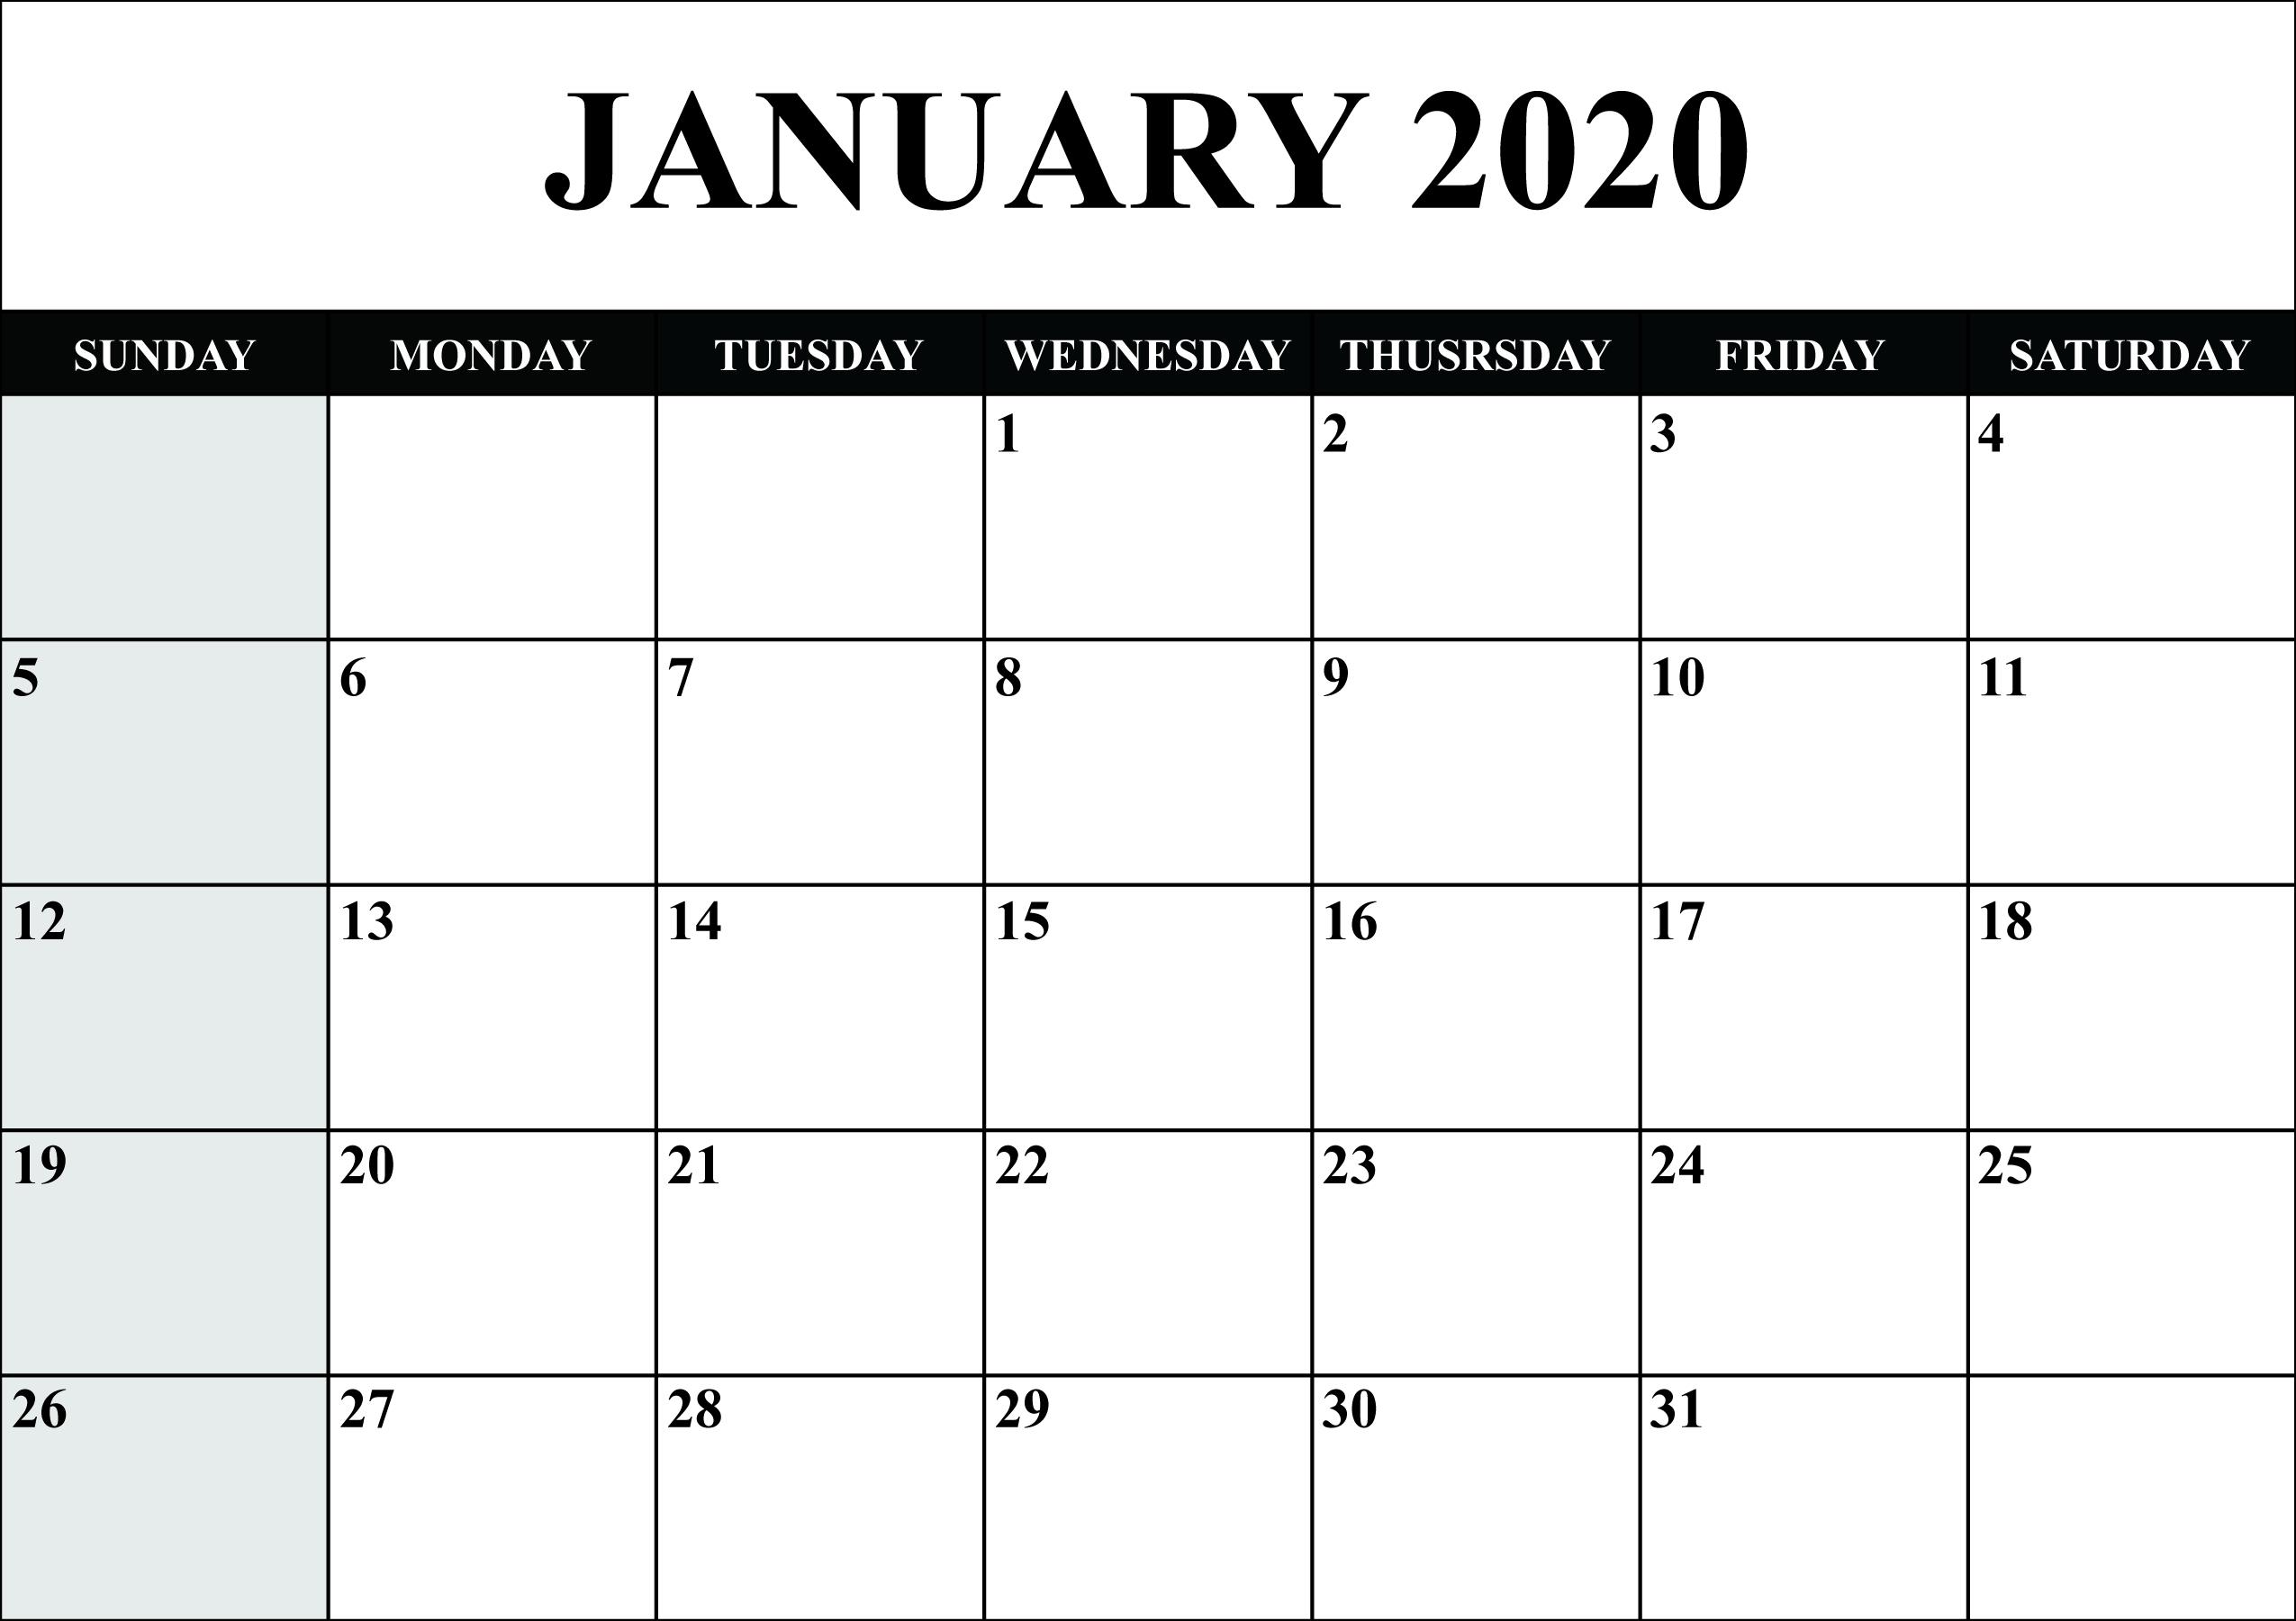 Free Blank January 2020 Calendar Printable In Pdf, Word-2020 Fill In Printable Monthly Calendar